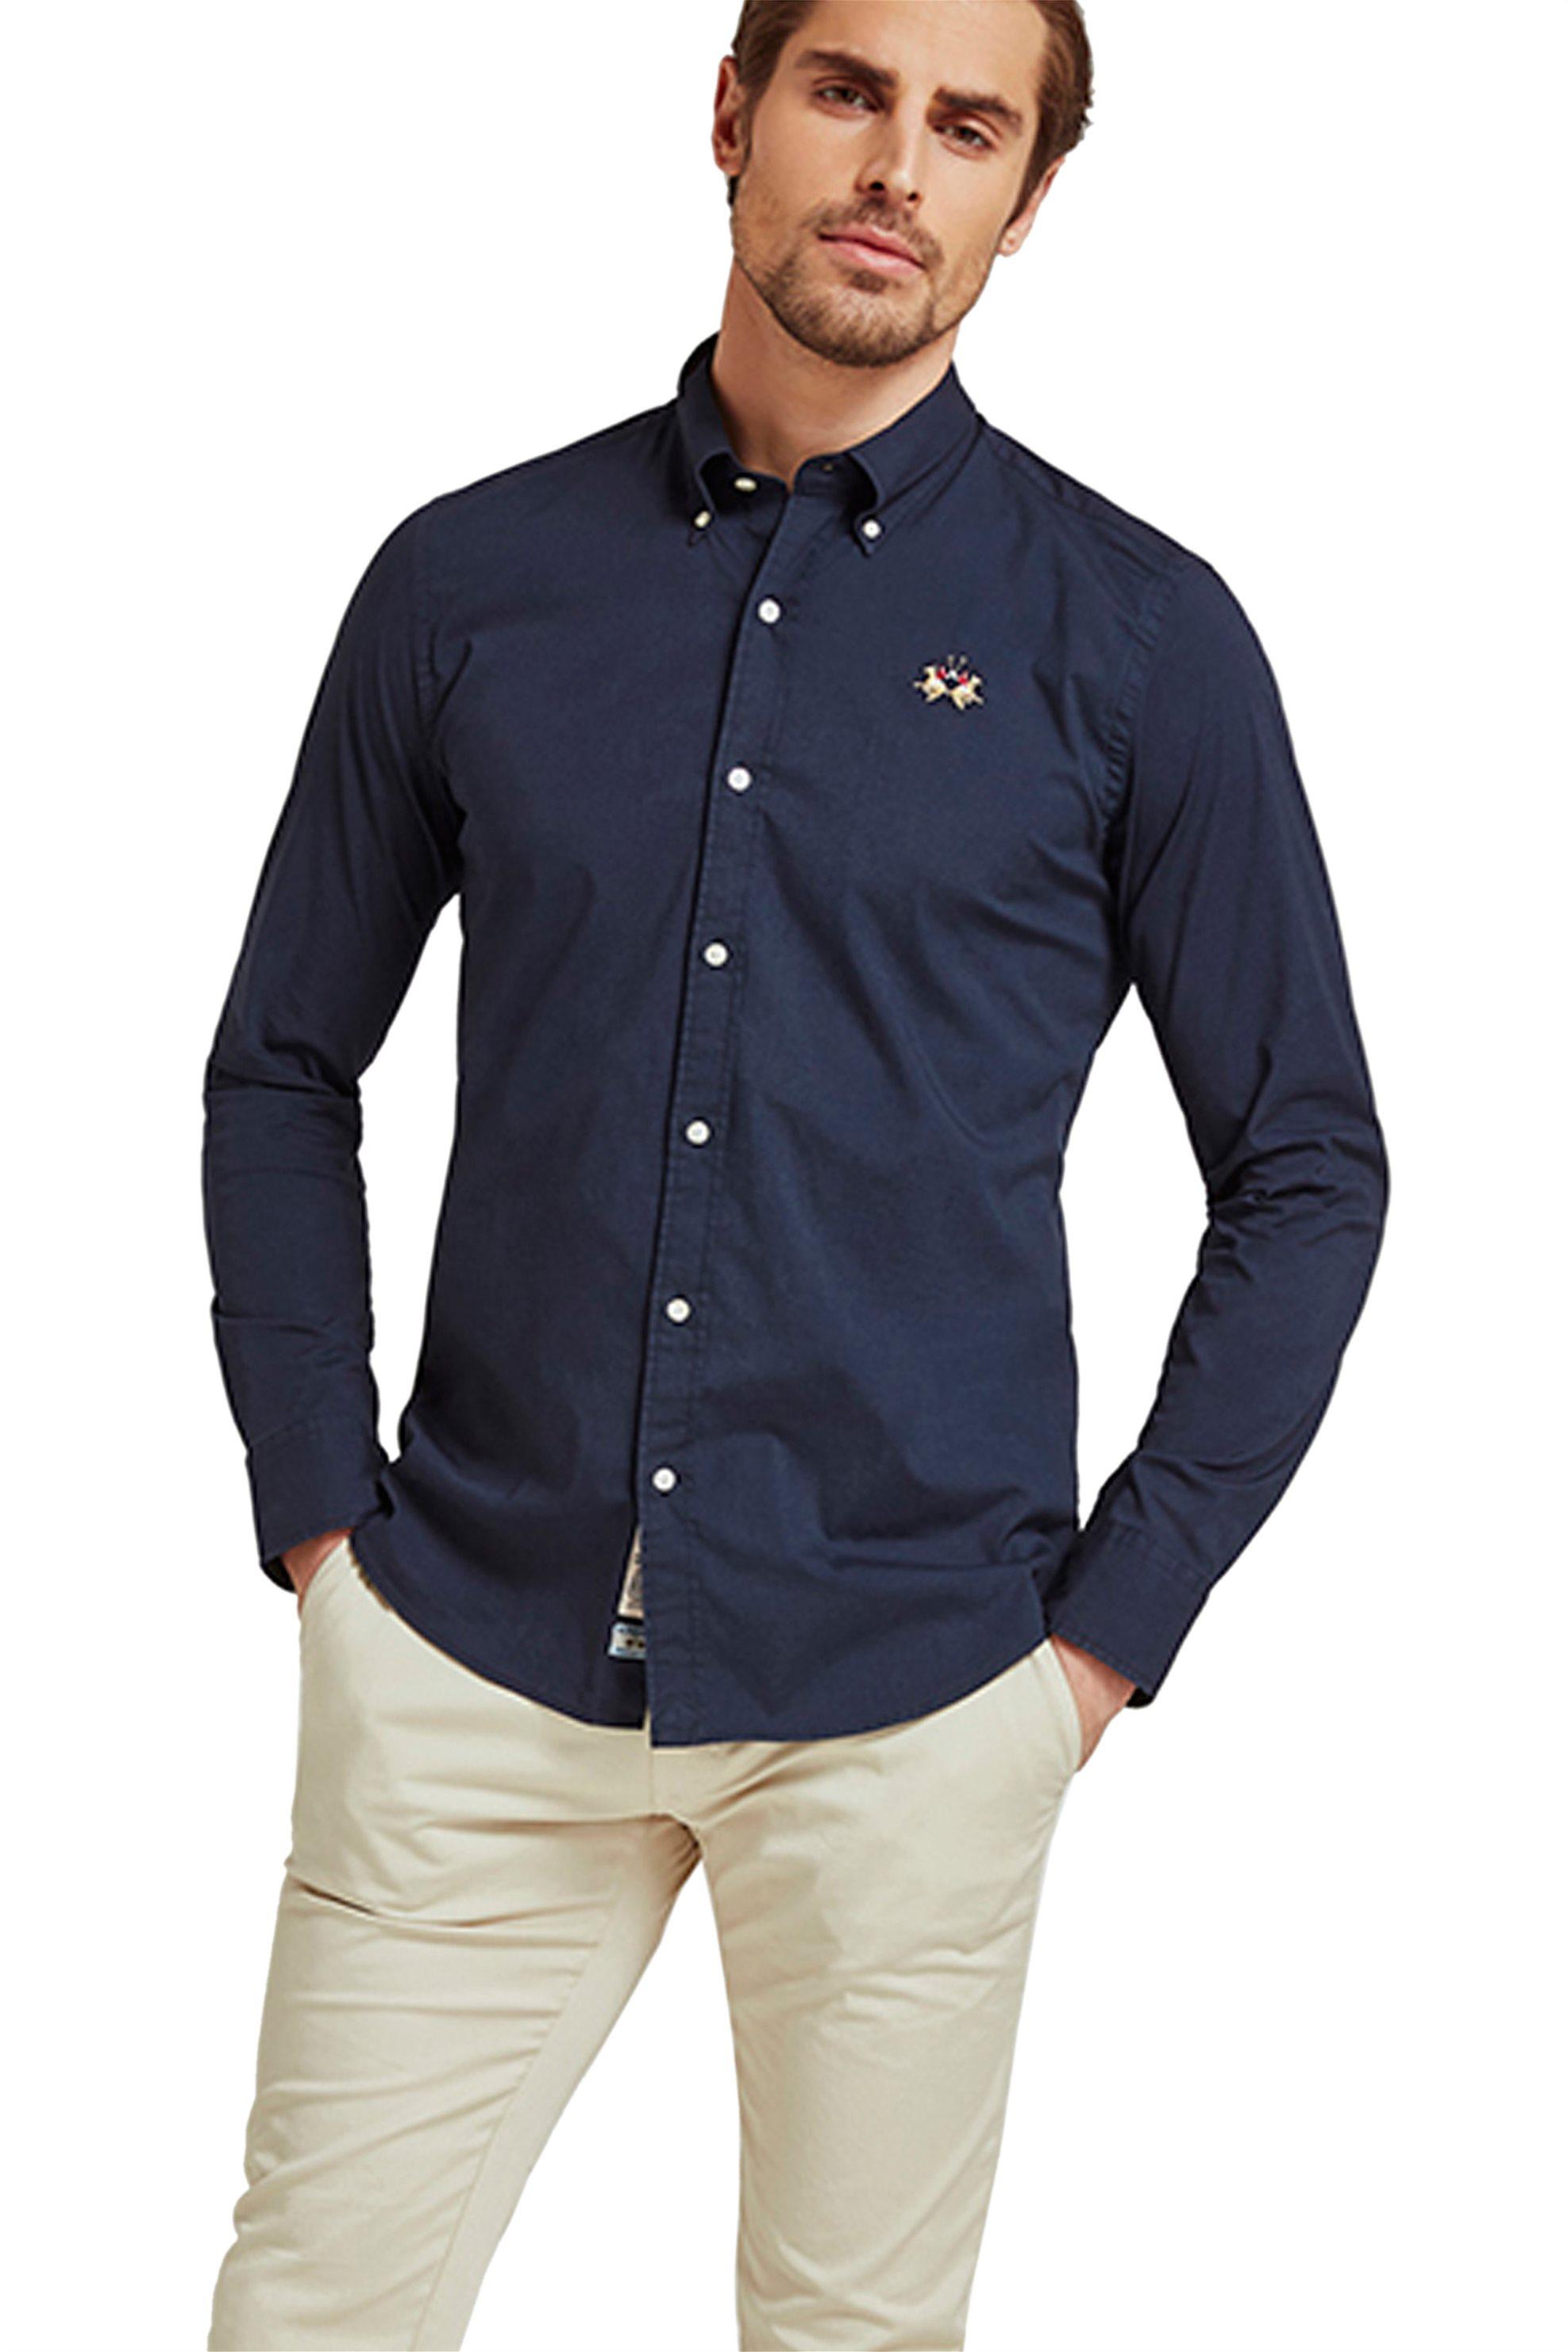 46670d87a9f7 Notos La Martina ανδρικό πουκάμισο με μικρό logo Leon - CCMC02-PP003 - Μπλε  Σκούρο